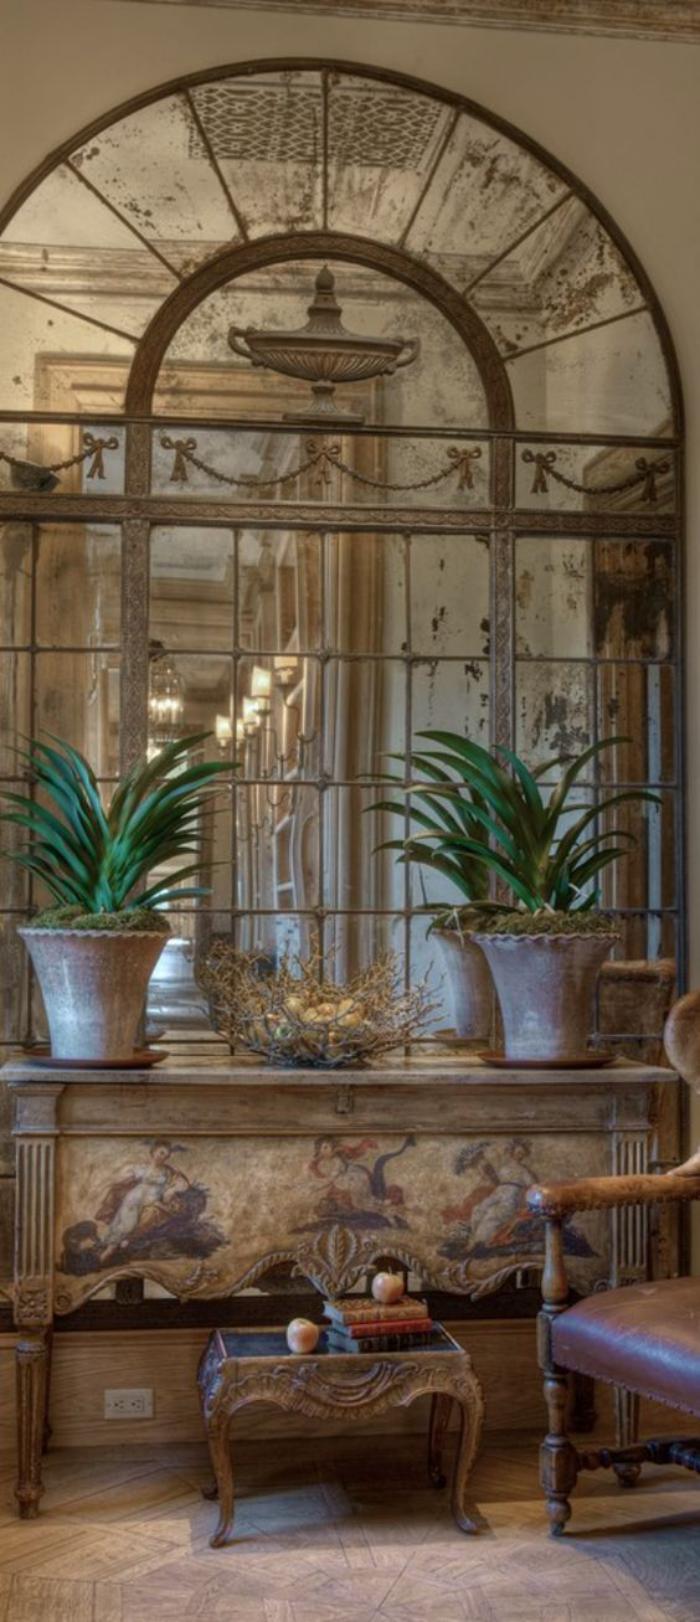 miroir-fenêtre-grand-miroir-arcade-vintage